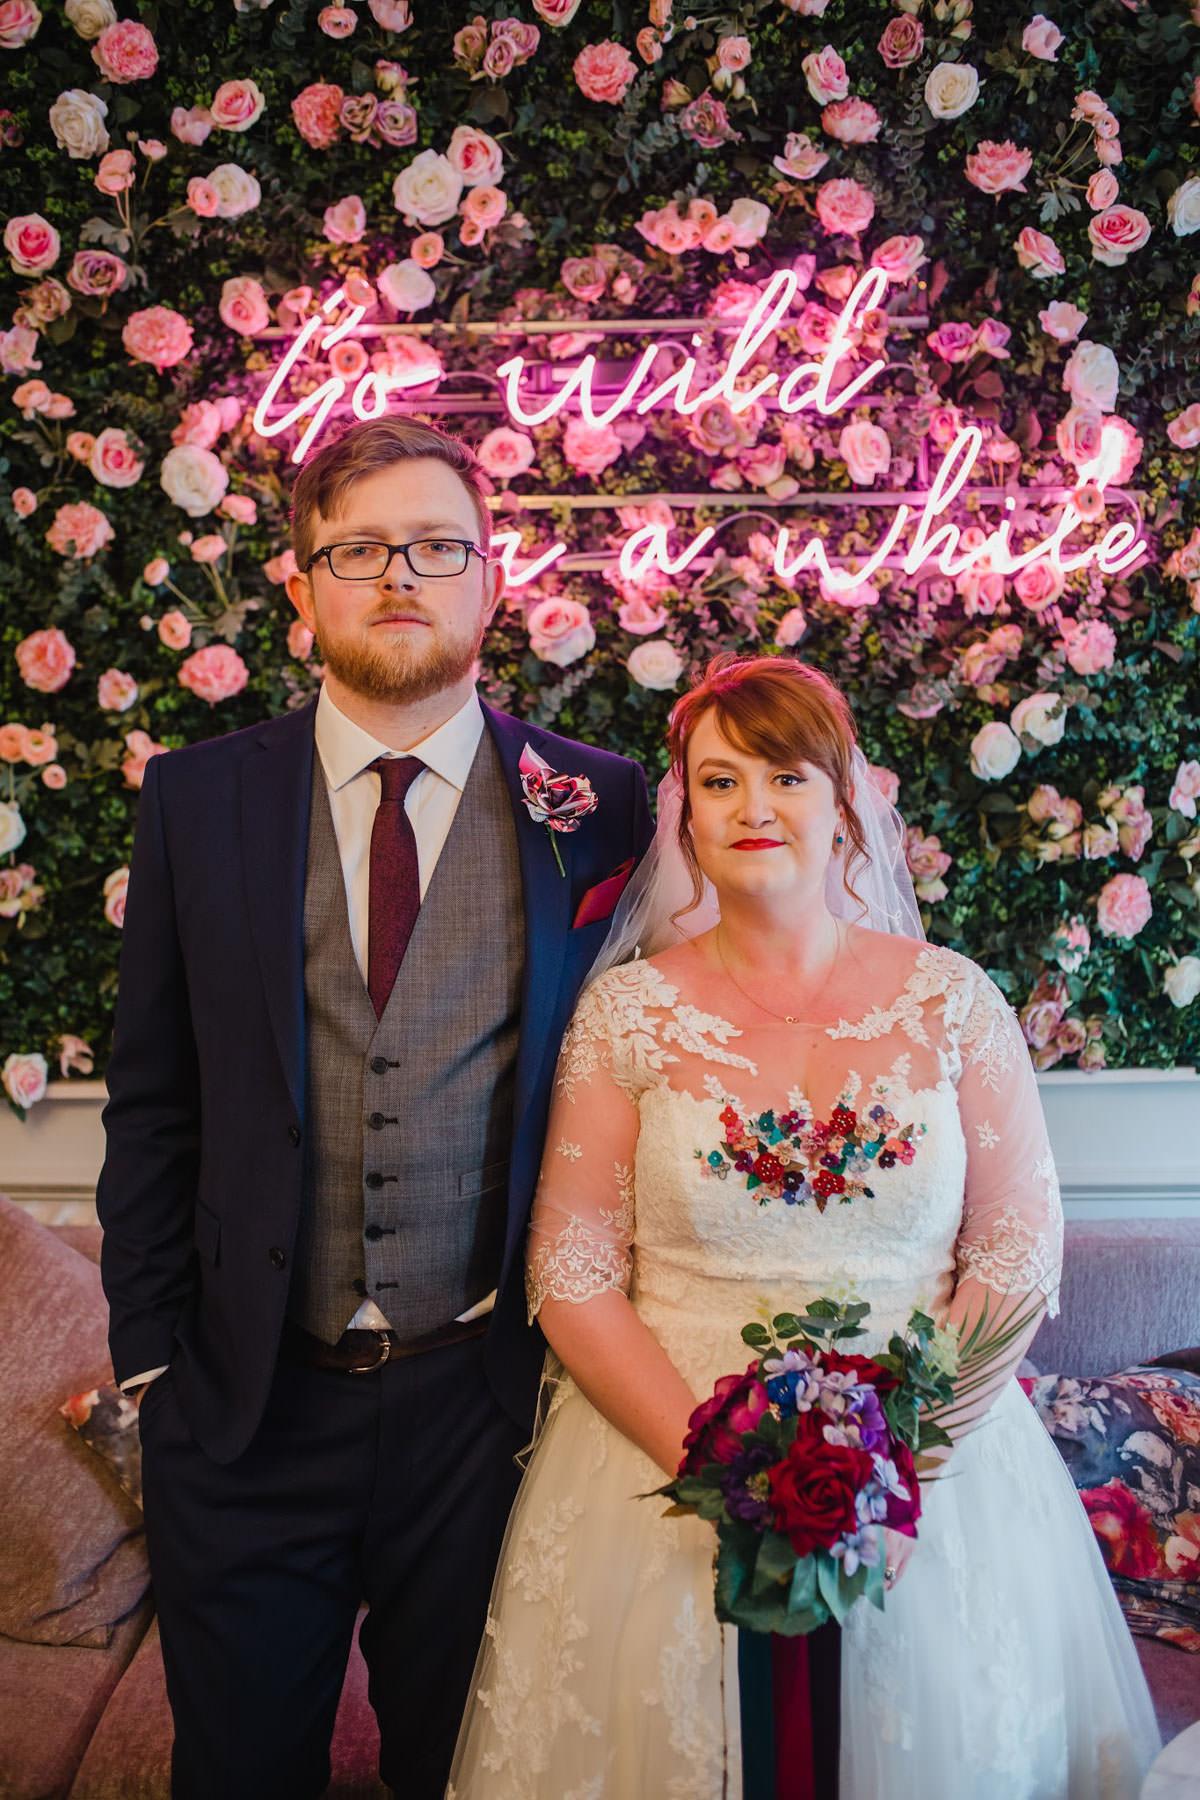 Atelier 19, cheltenham embroidery, cheltenham wedding dresses, Embellished wedding dress, embellishment, hairpieces, neckpiece, sash, veil. embellished shoes, vintage wedding dress, wedding dress designer, wedding embellishment